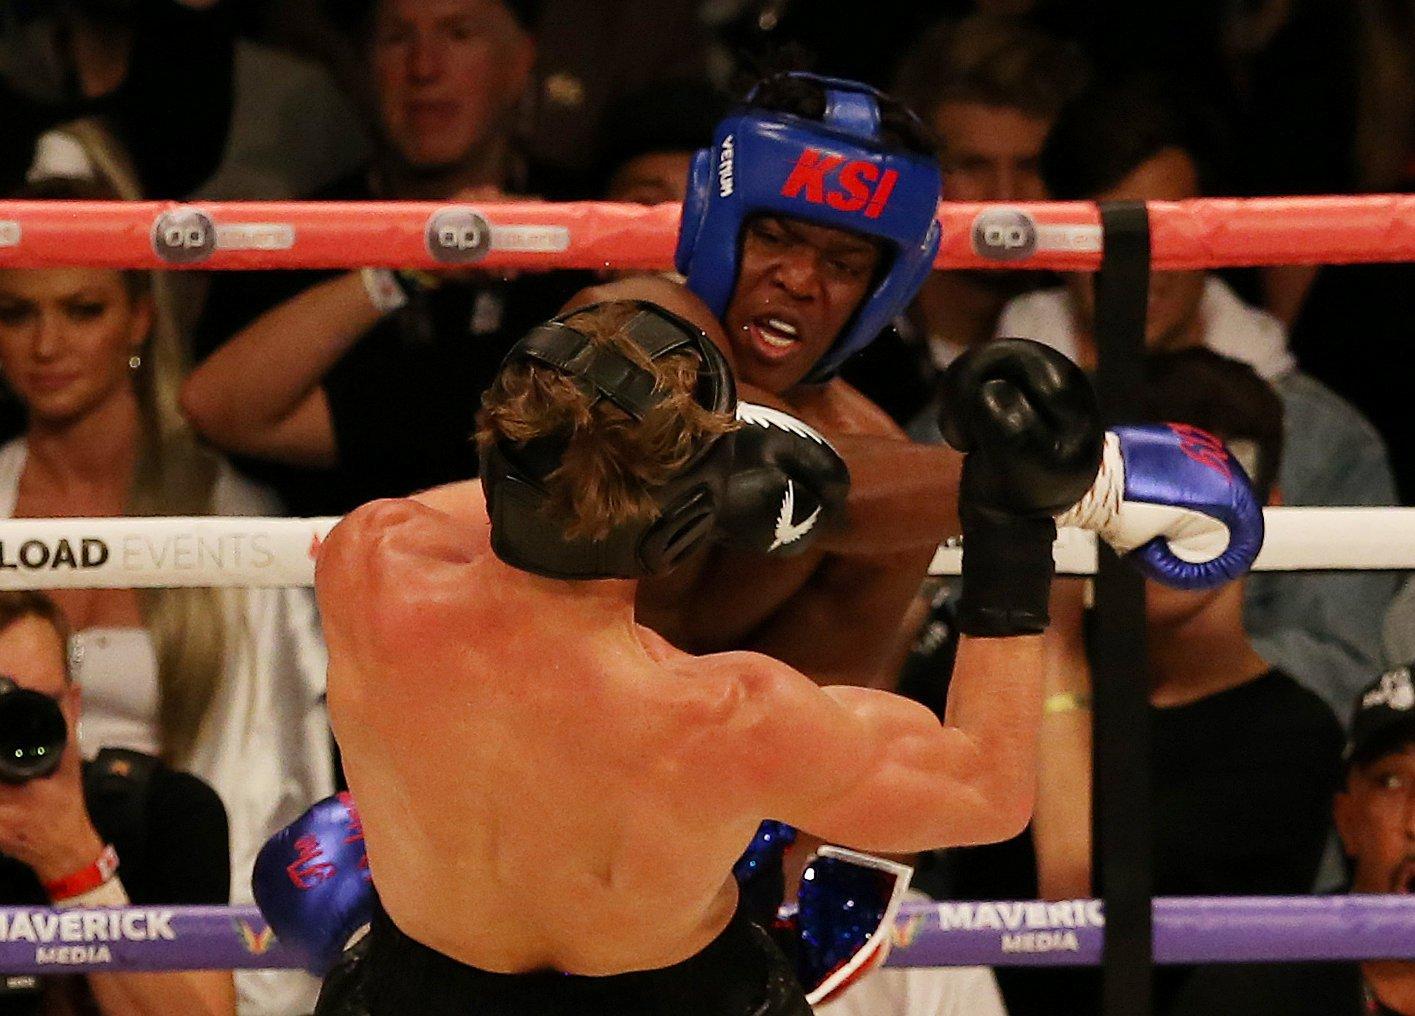 Boxing - KSI v Logan Paul - Manchester Arena, Manchester, Britain - August 25, 2018 Logan Paul in action against KSI REUTERS/Tom Jacobs